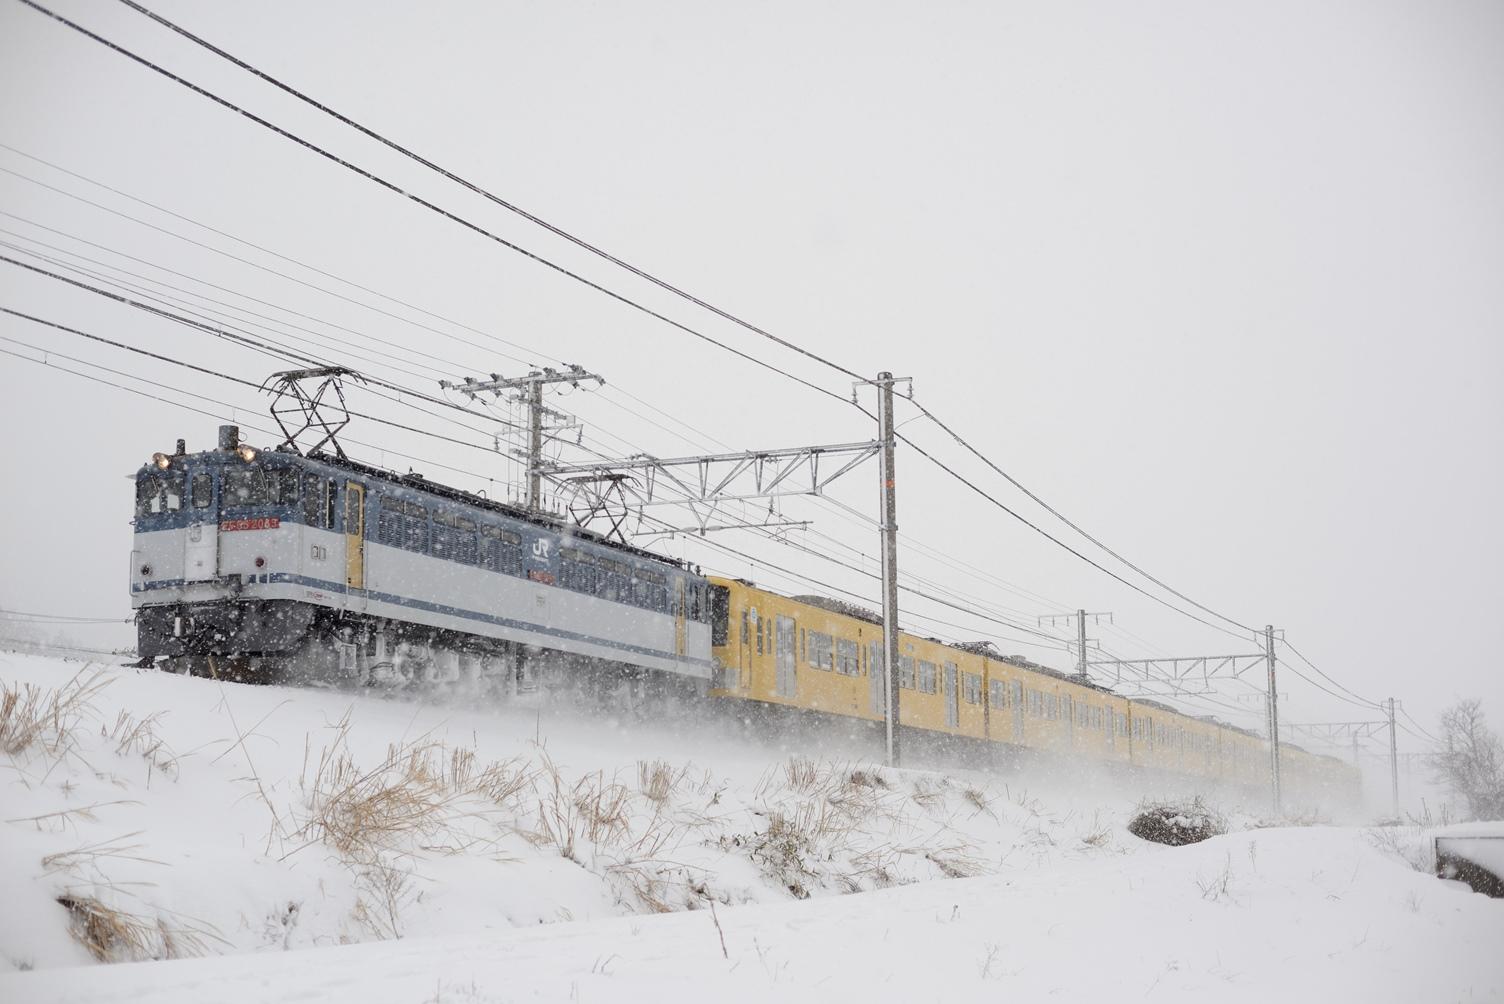 DSC_4521.jpg